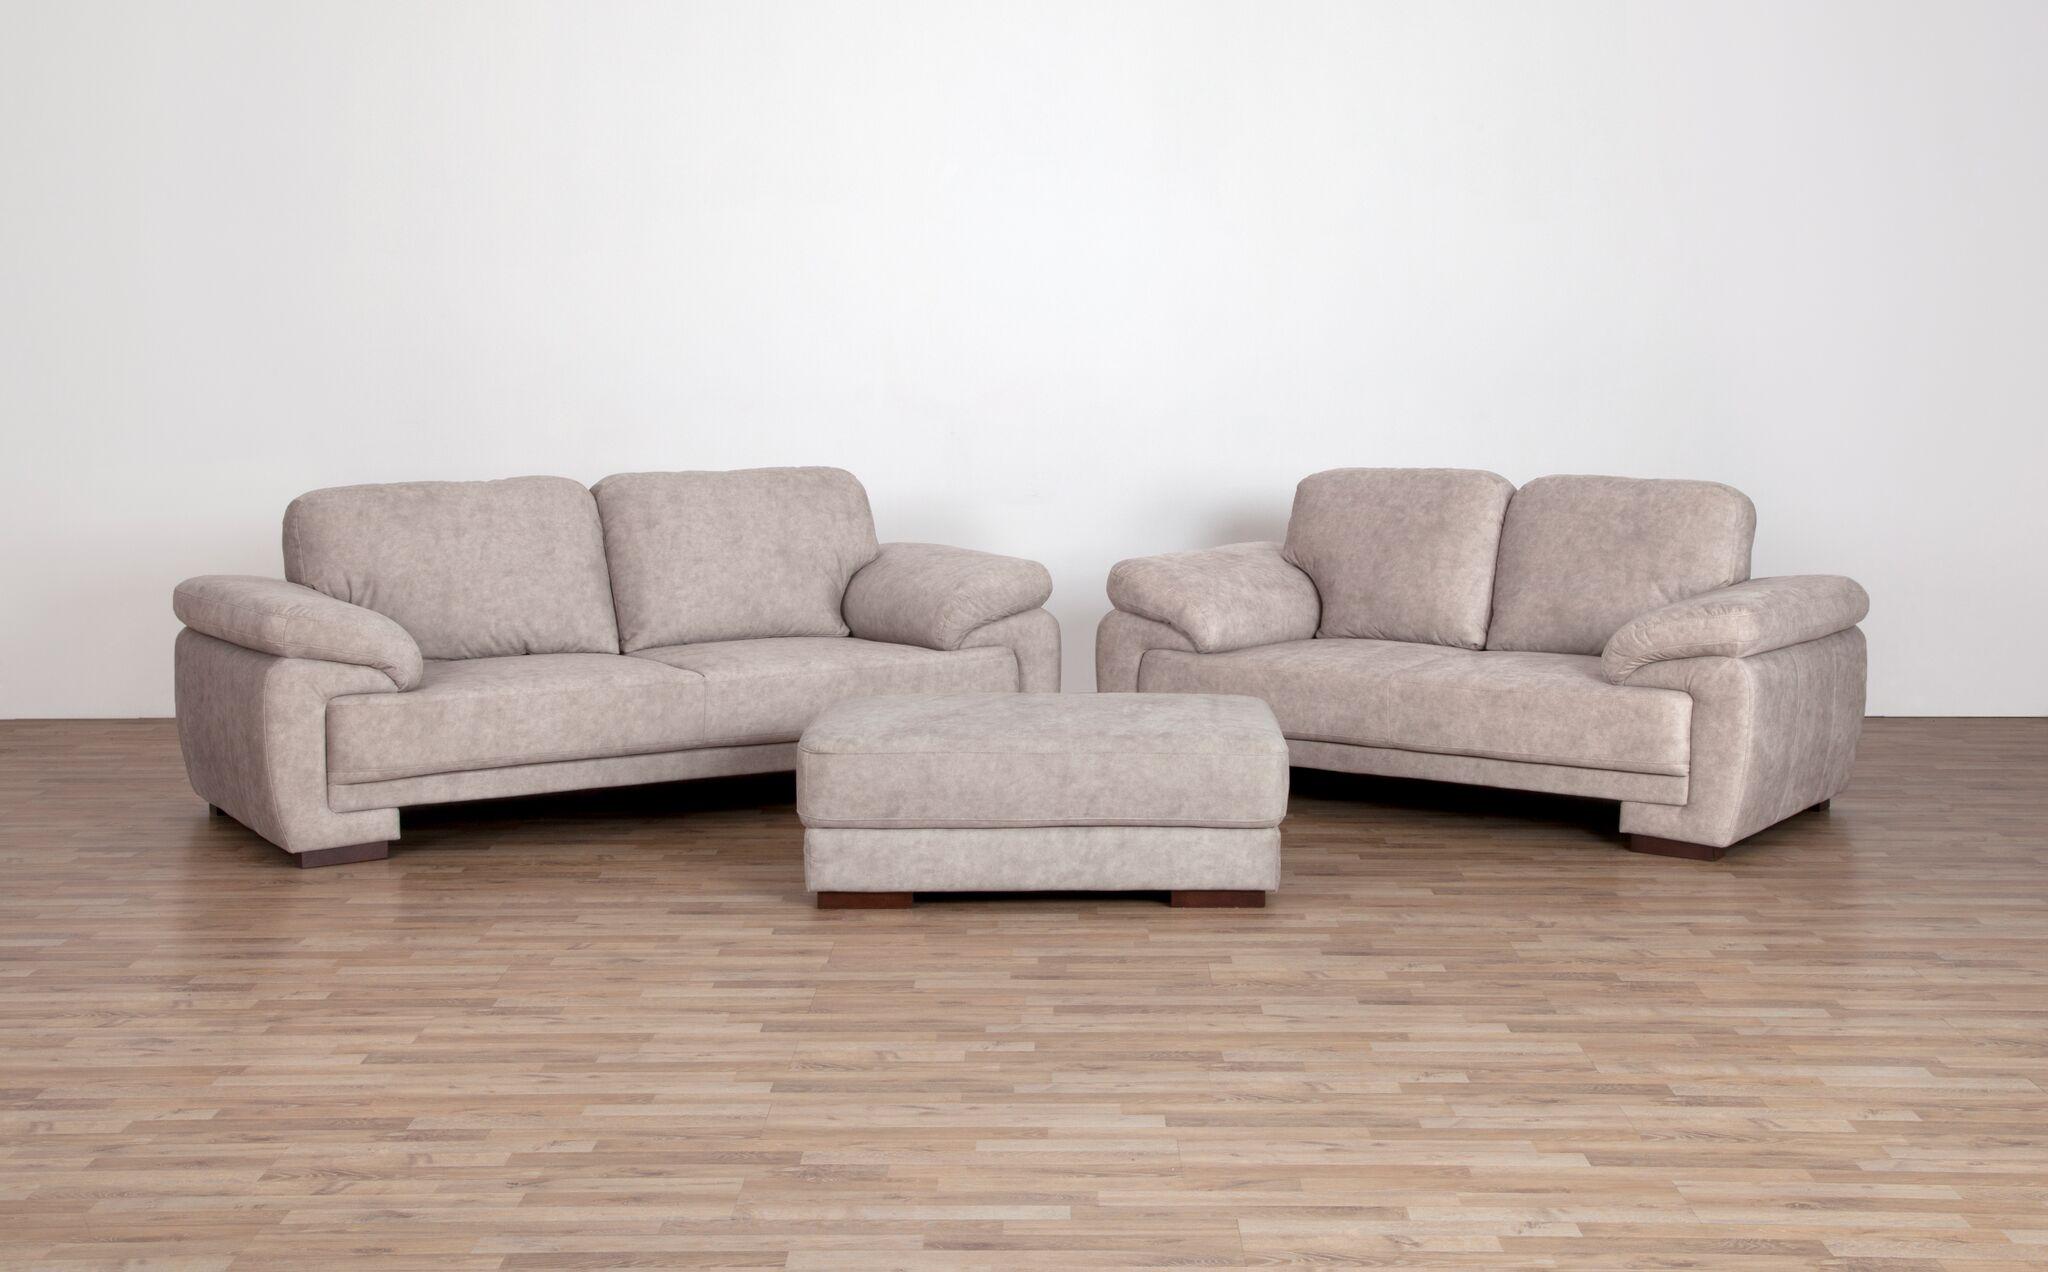 2 er sofa neve von matex hellbraun. Black Bedroom Furniture Sets. Home Design Ideas